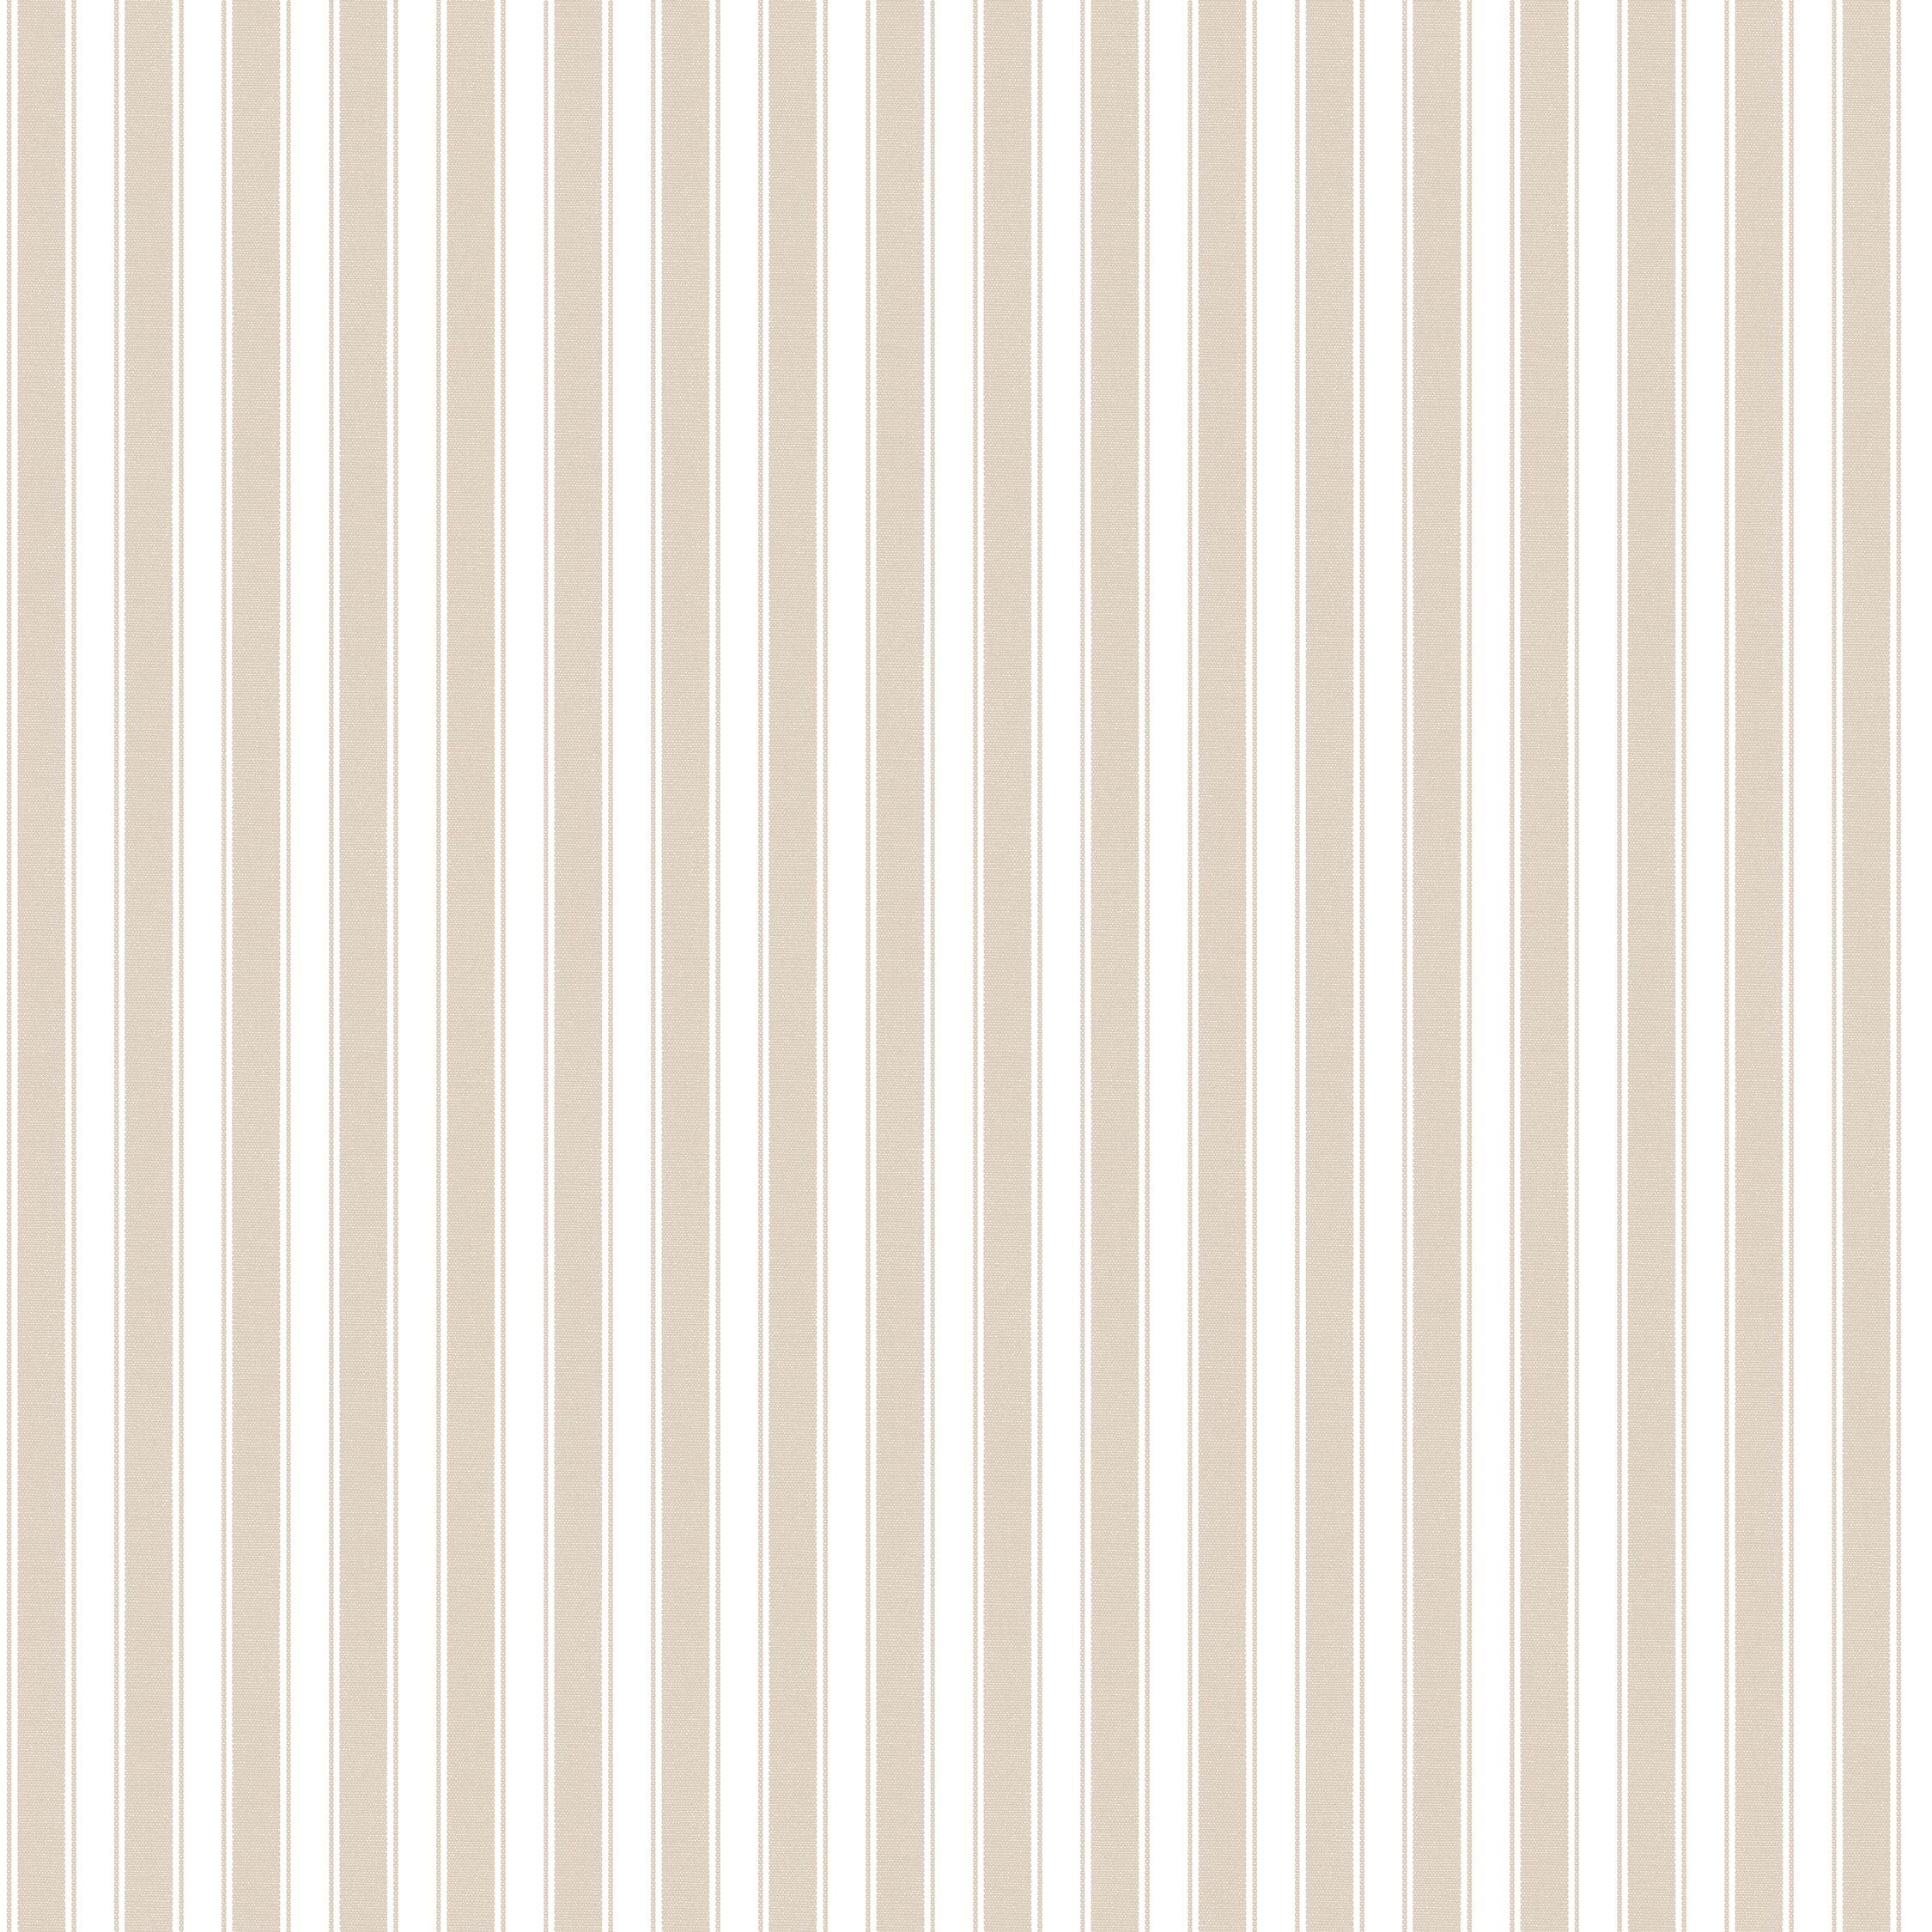 Galerie Galerie Seaside Stripe Wallpaper